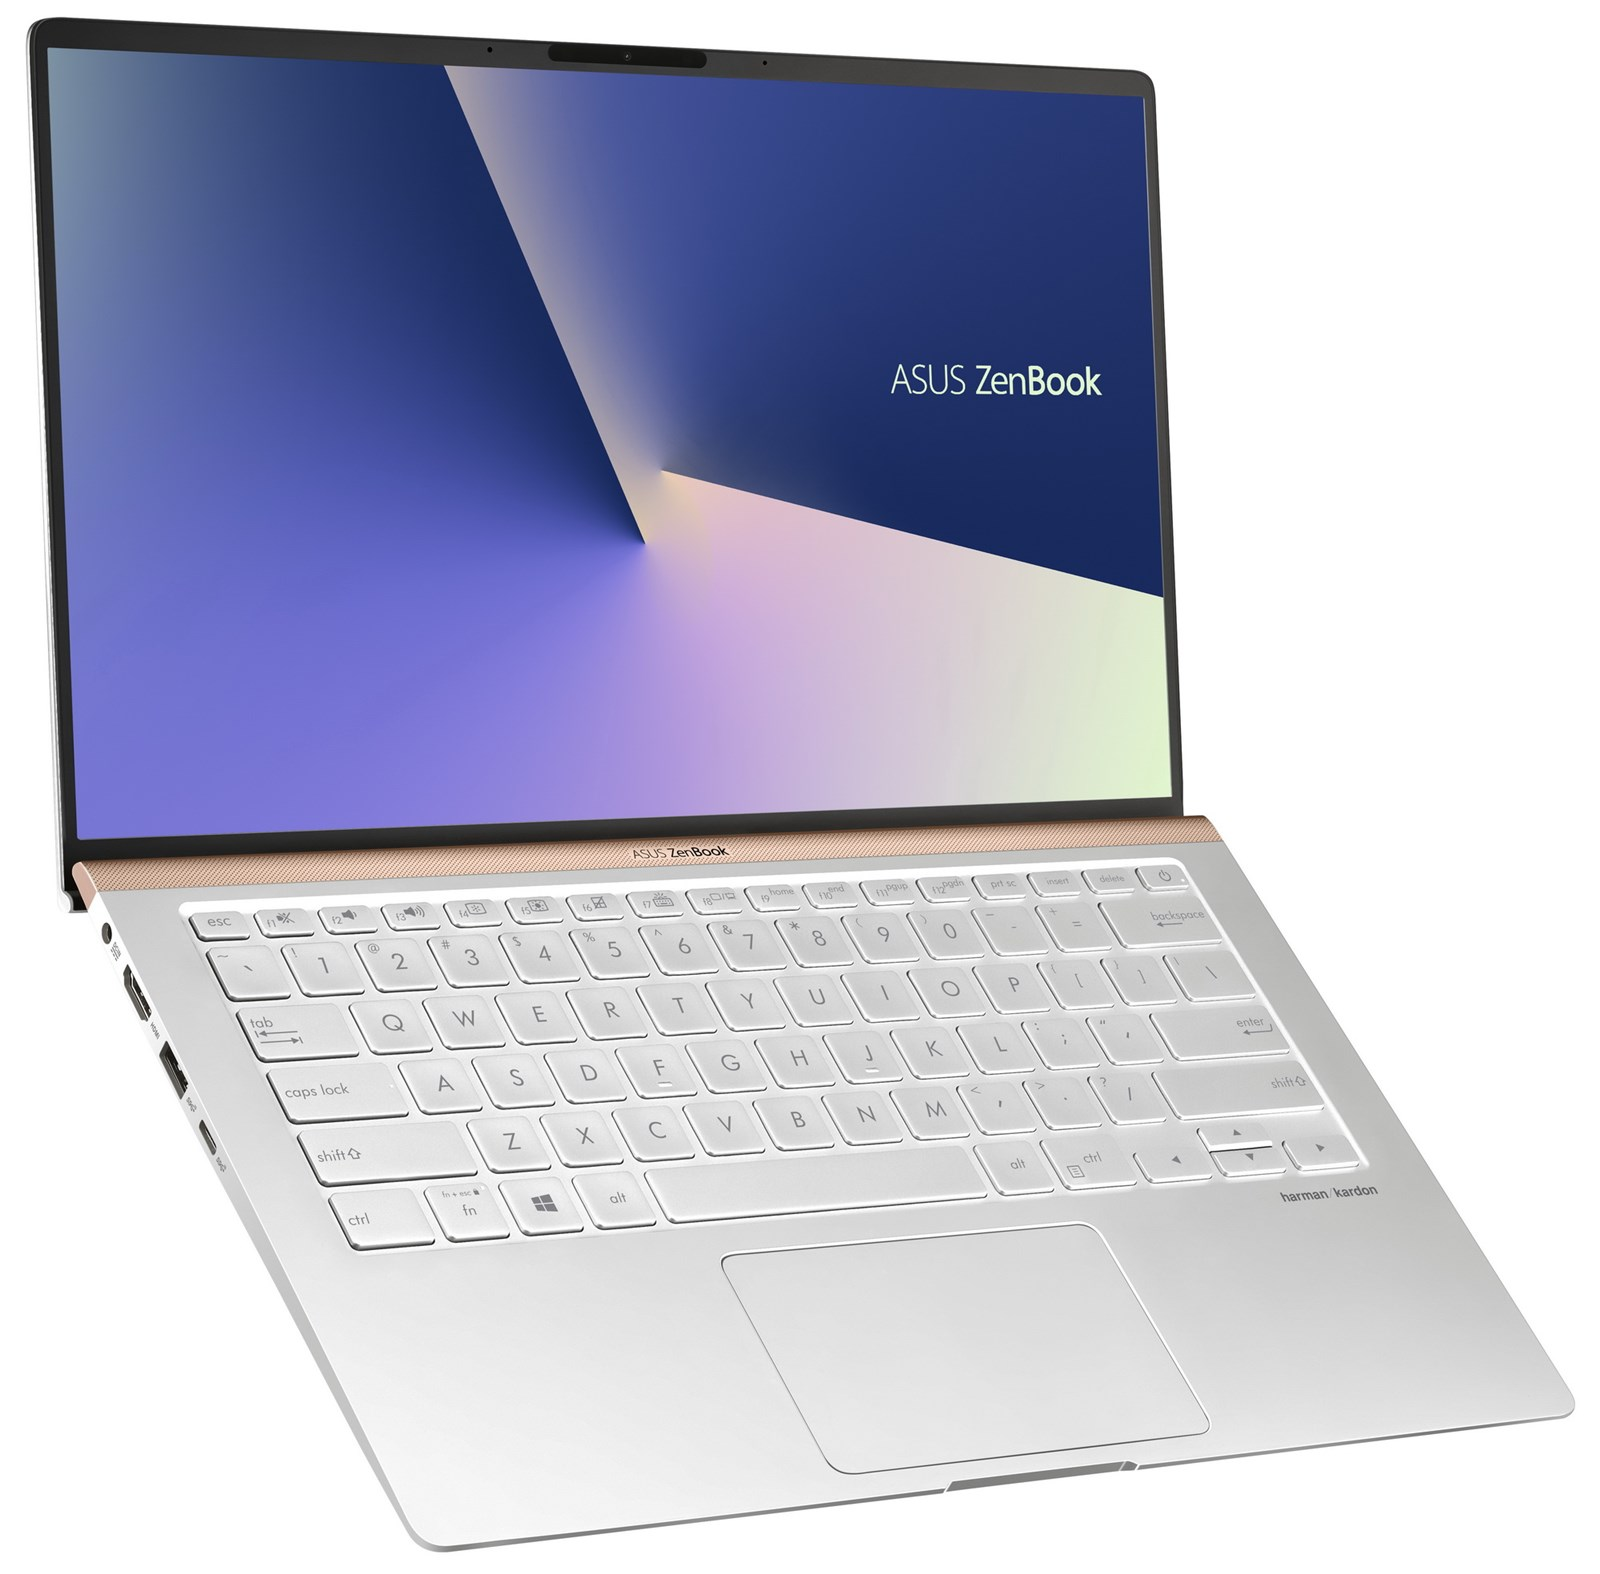 ASUS ZenBook 14 (UX433FA-XH54) 14